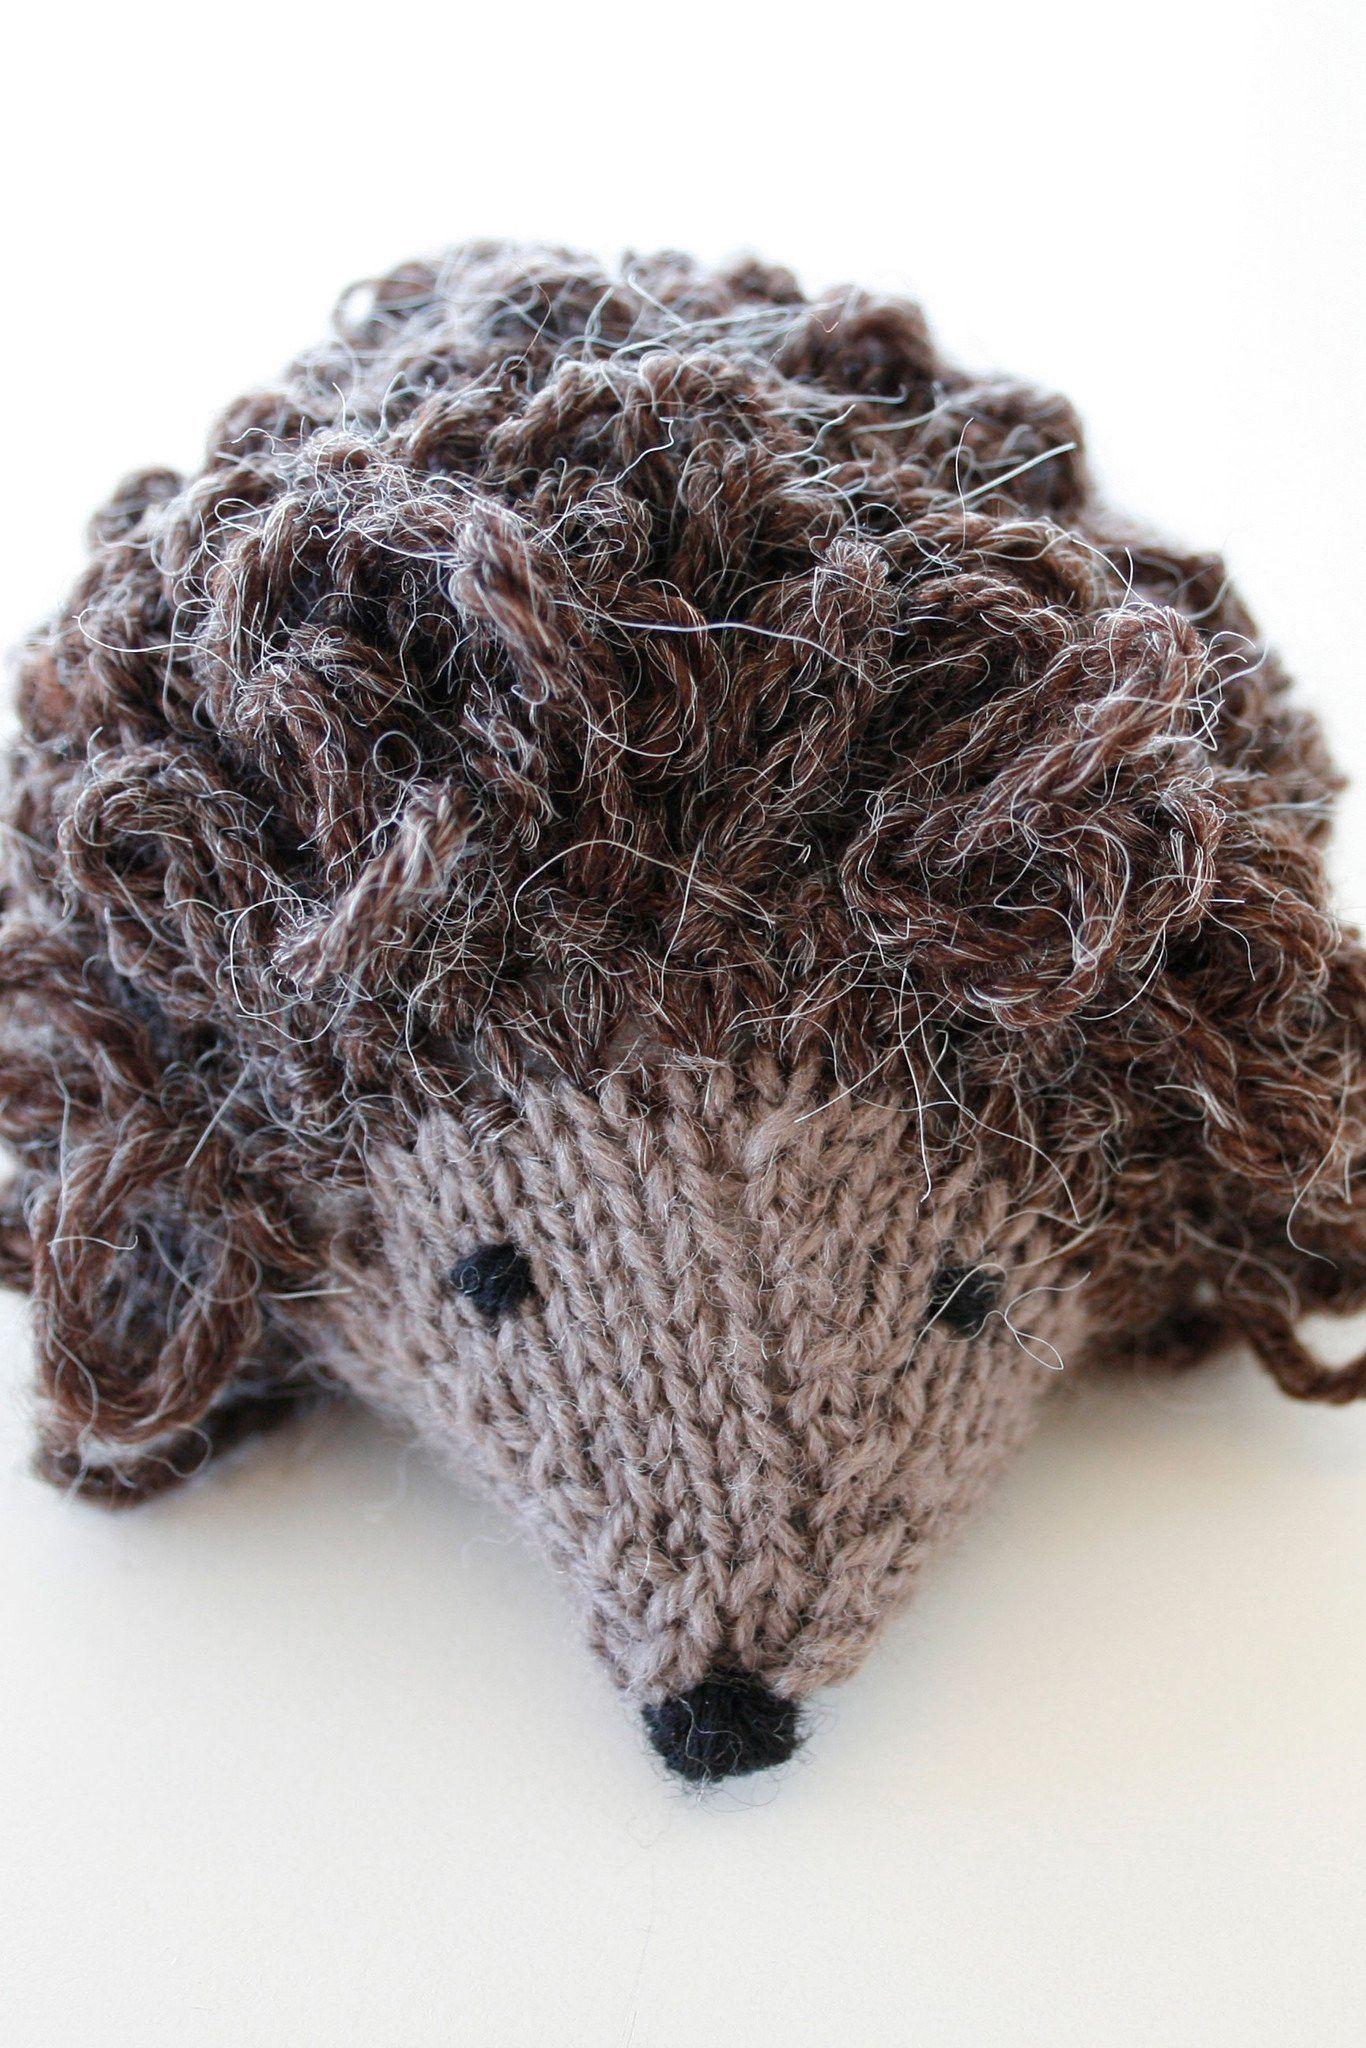 DK Hedgehog Toy Knitting Pattern | The Knitting Network